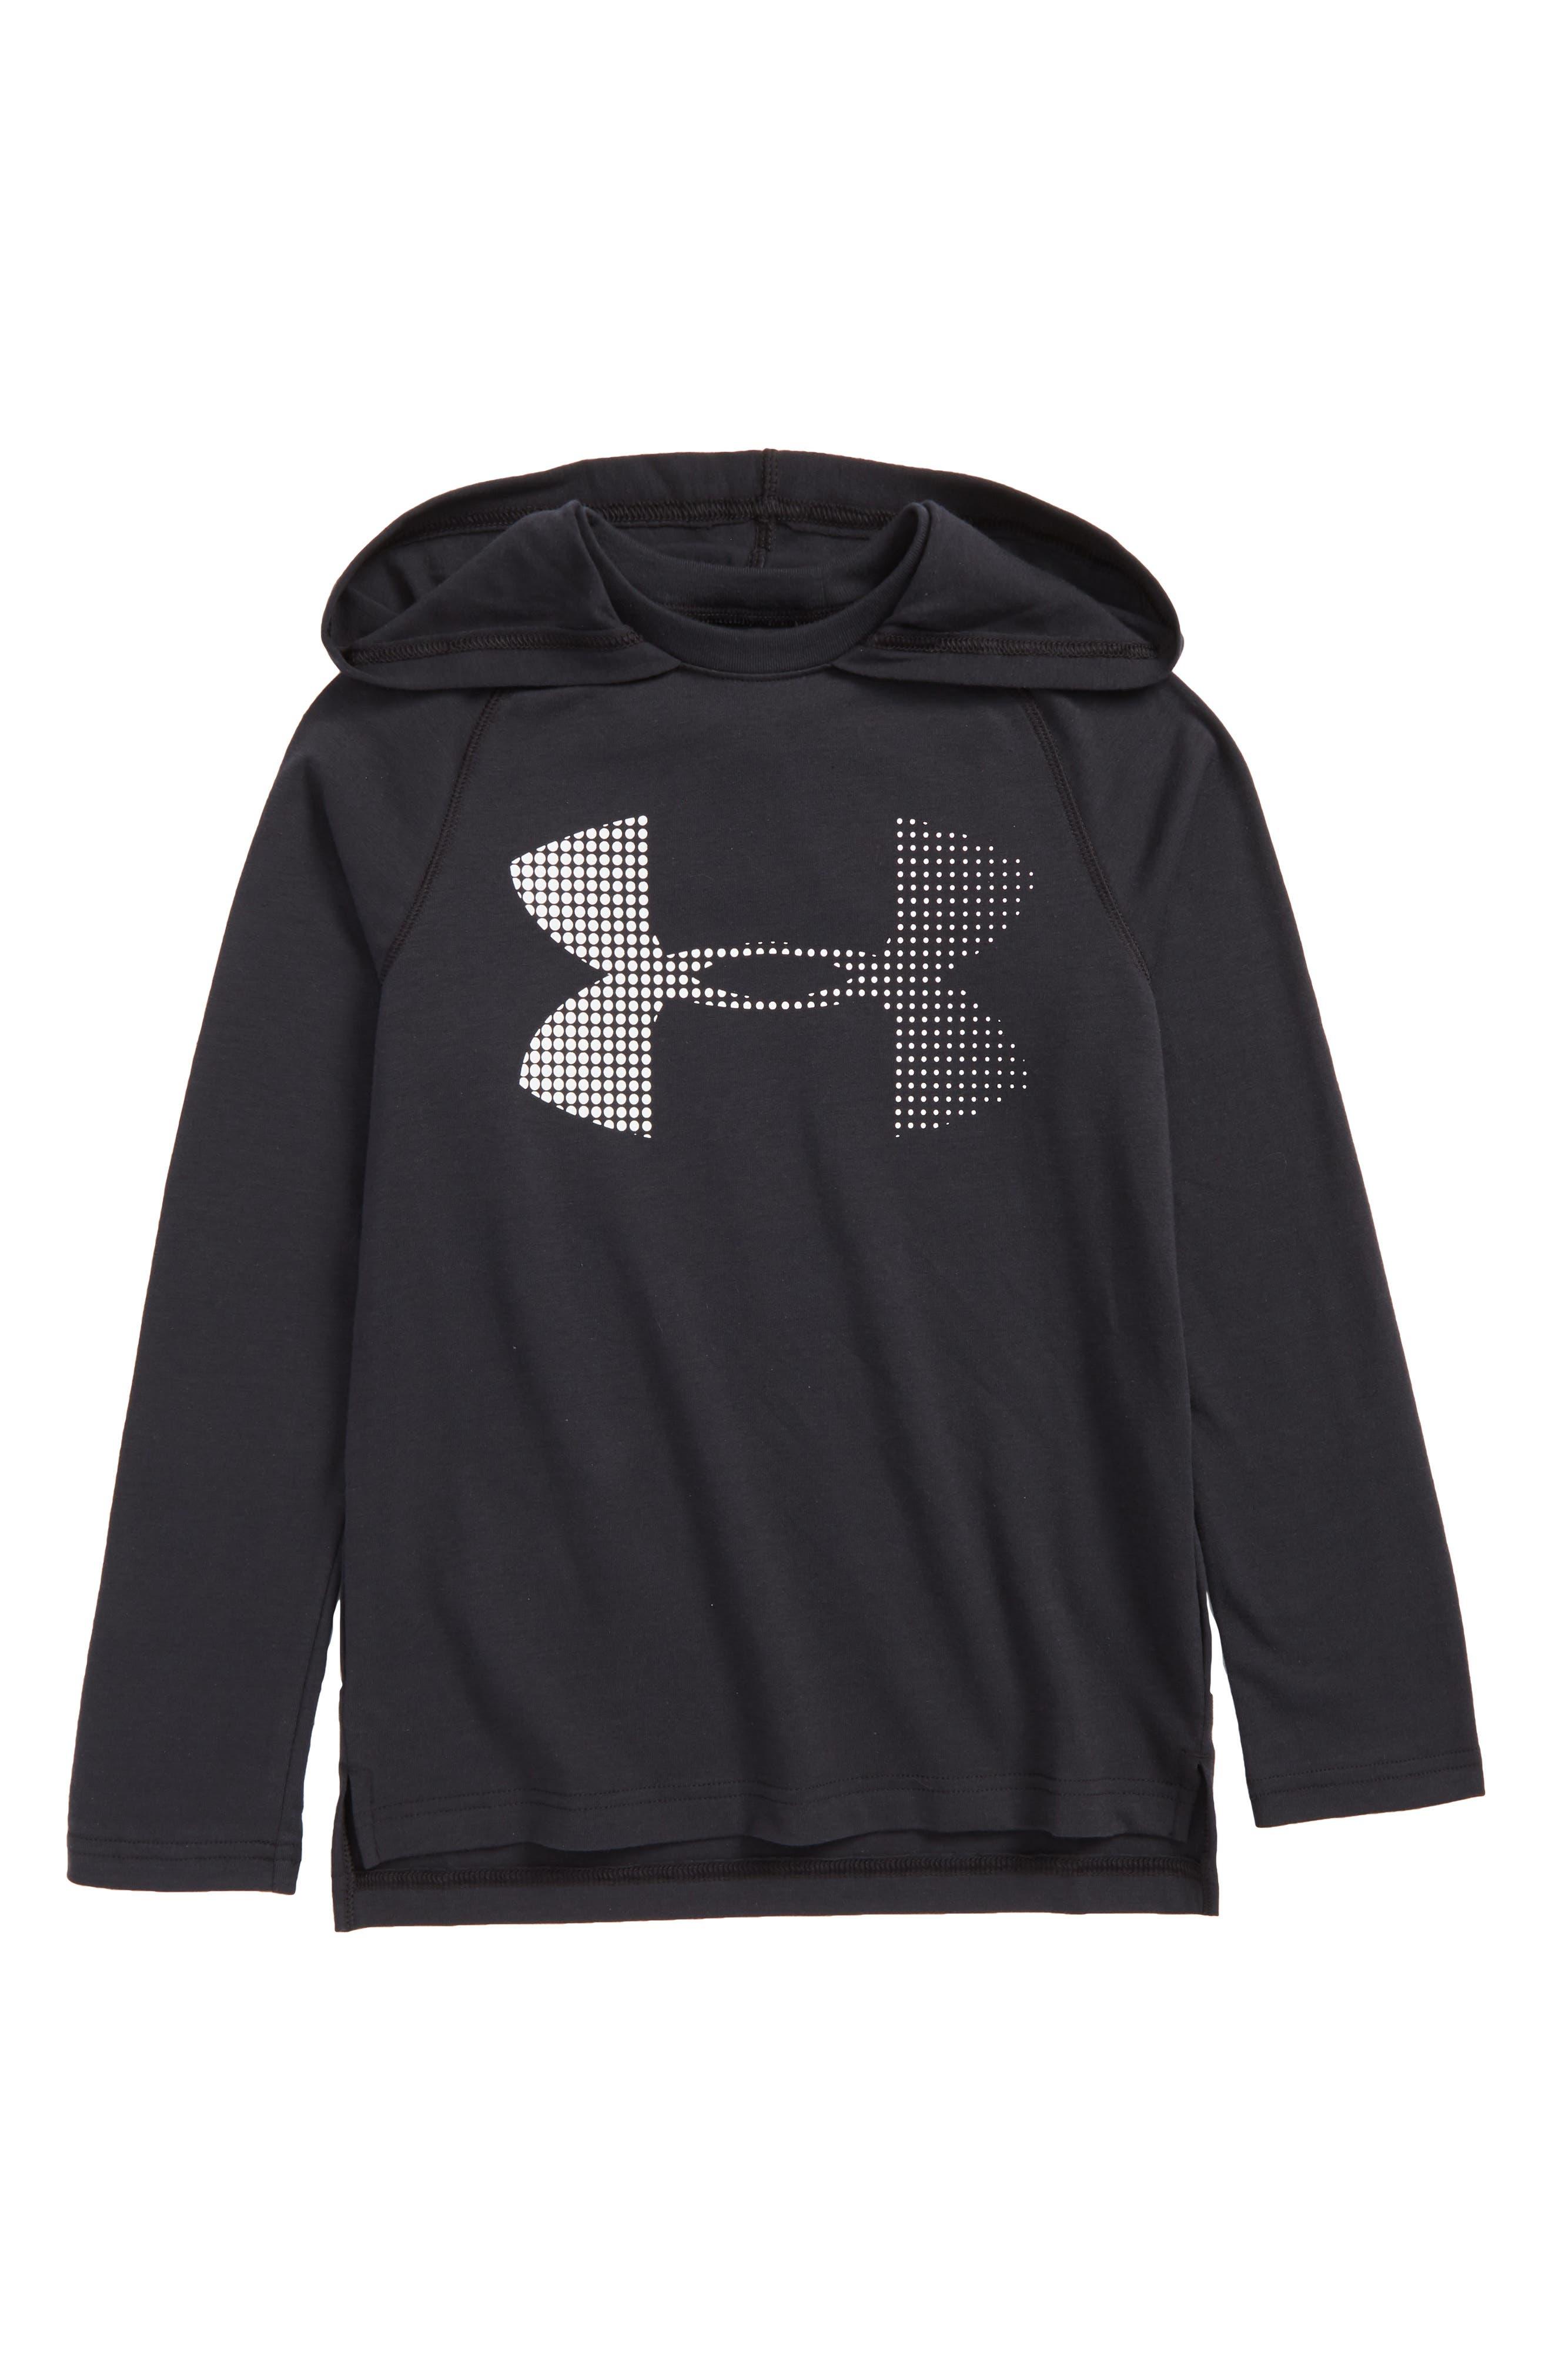 HeatGear<sup>®</sup> Hoodie,                         Main,                         color, Black/ White